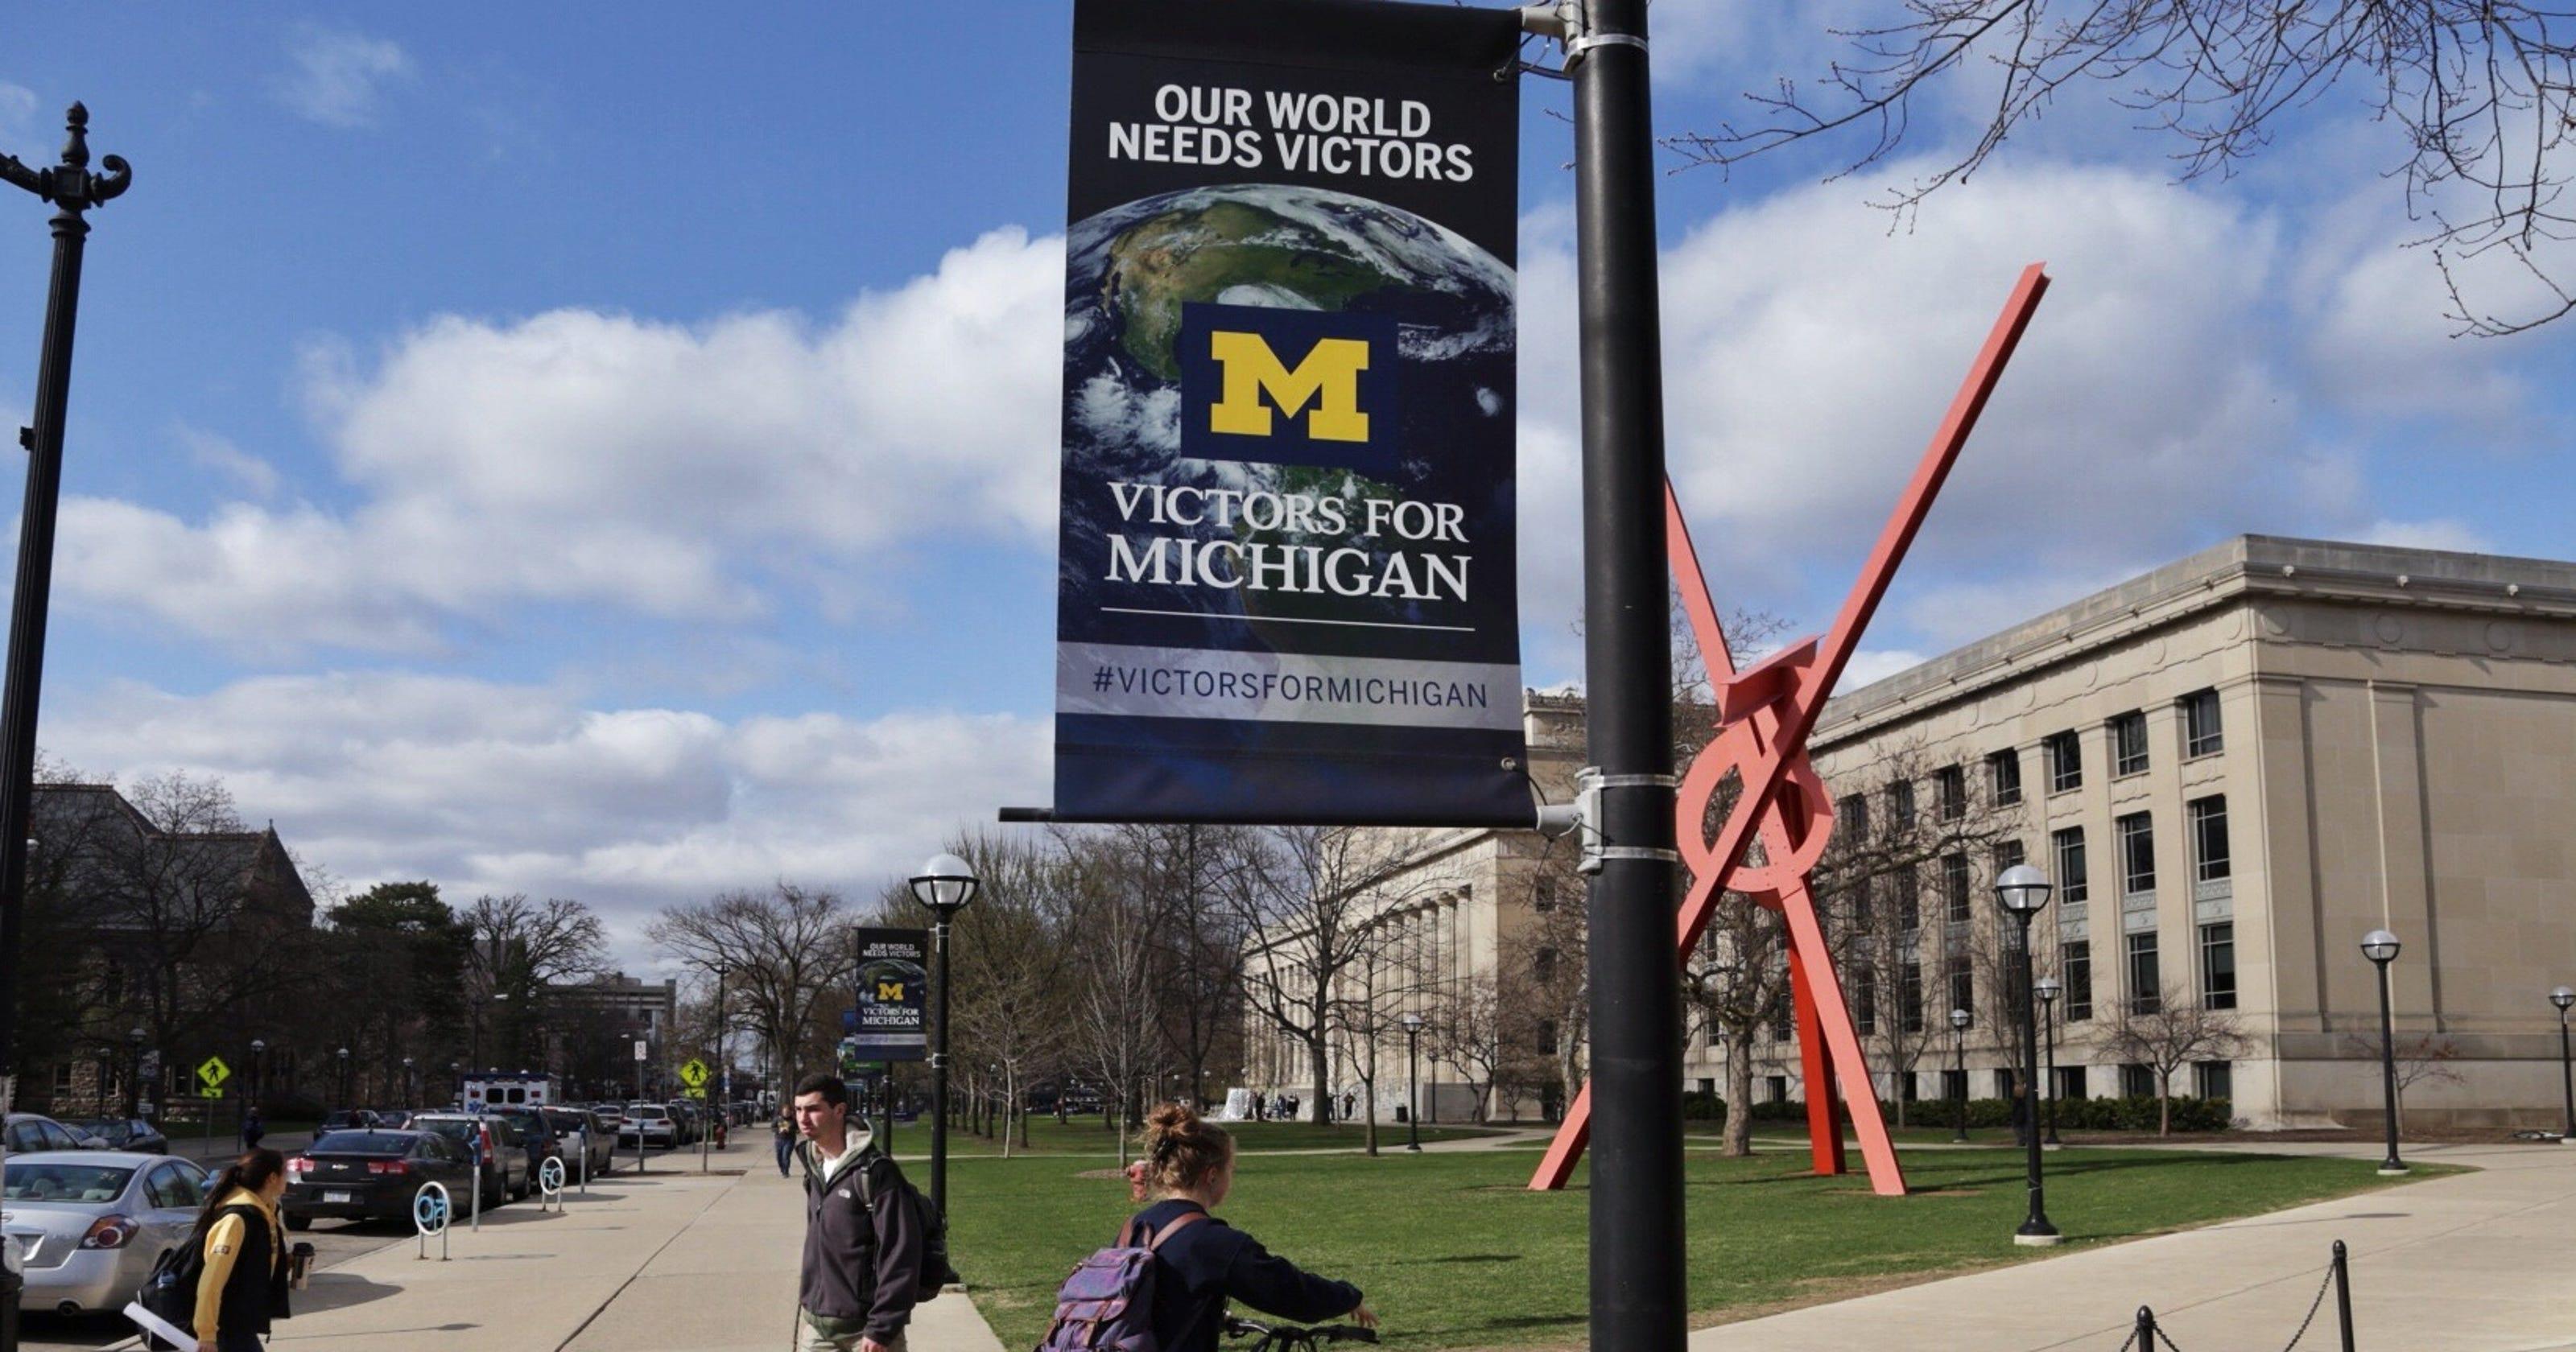 Minority enrollment up at U-M